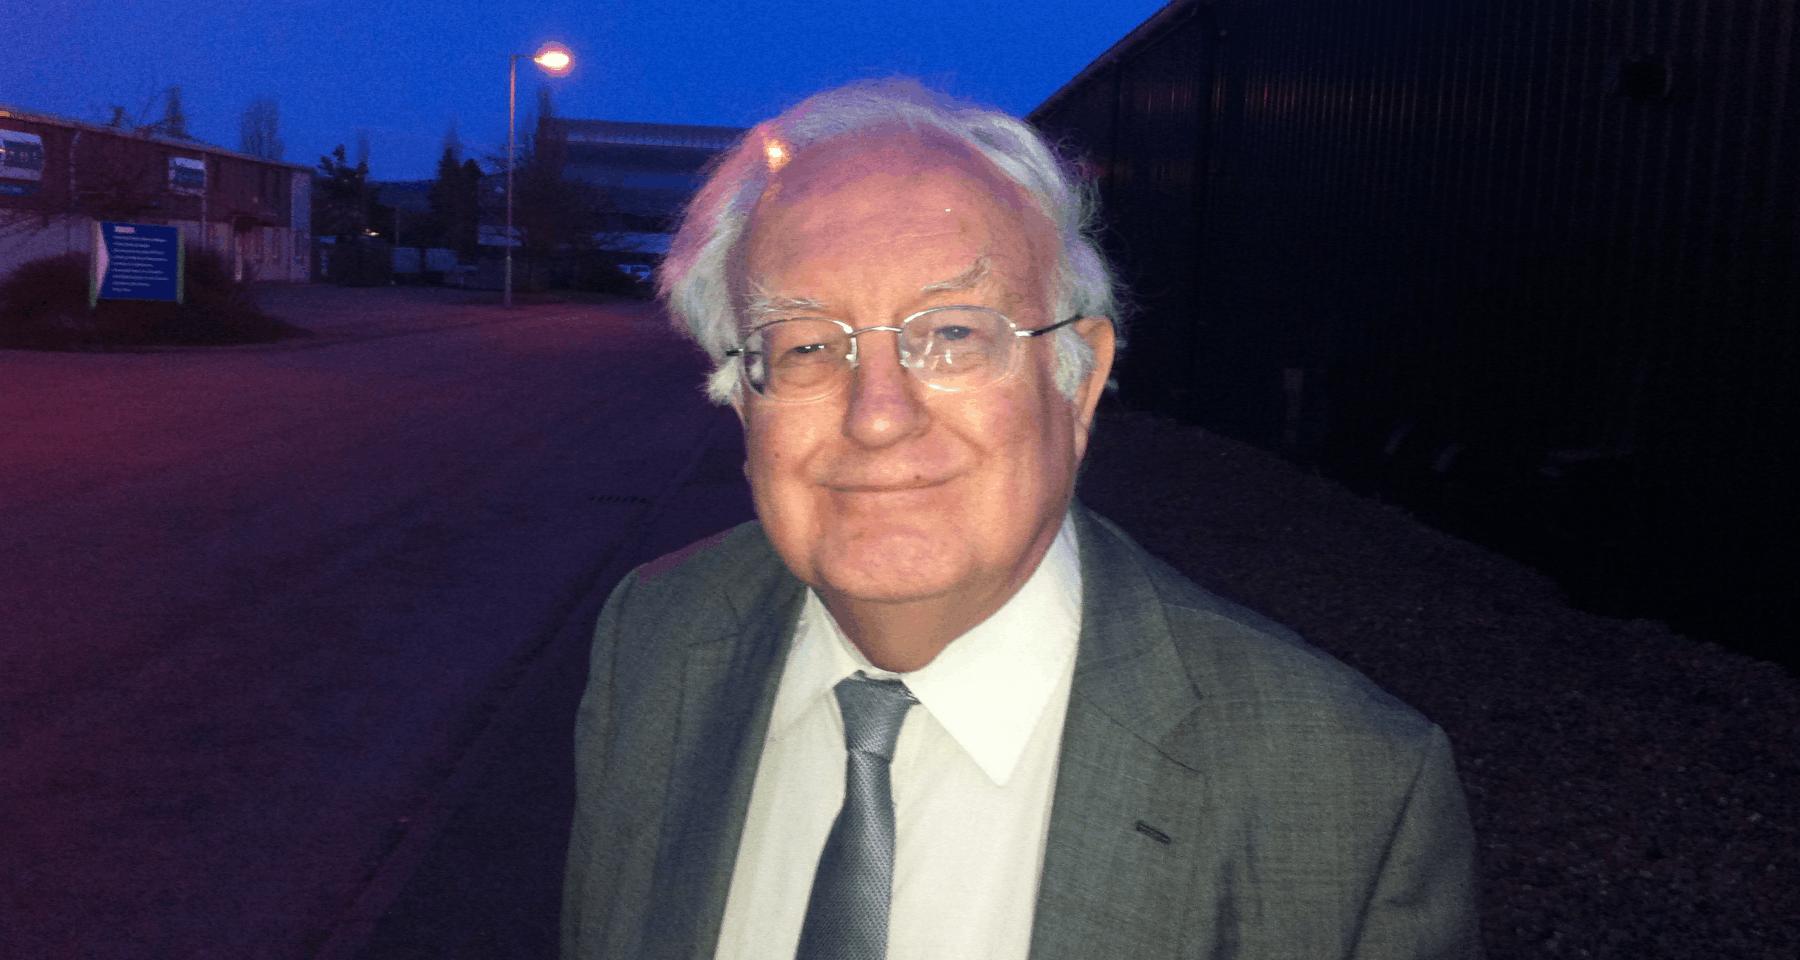 Kenneth MacLeod